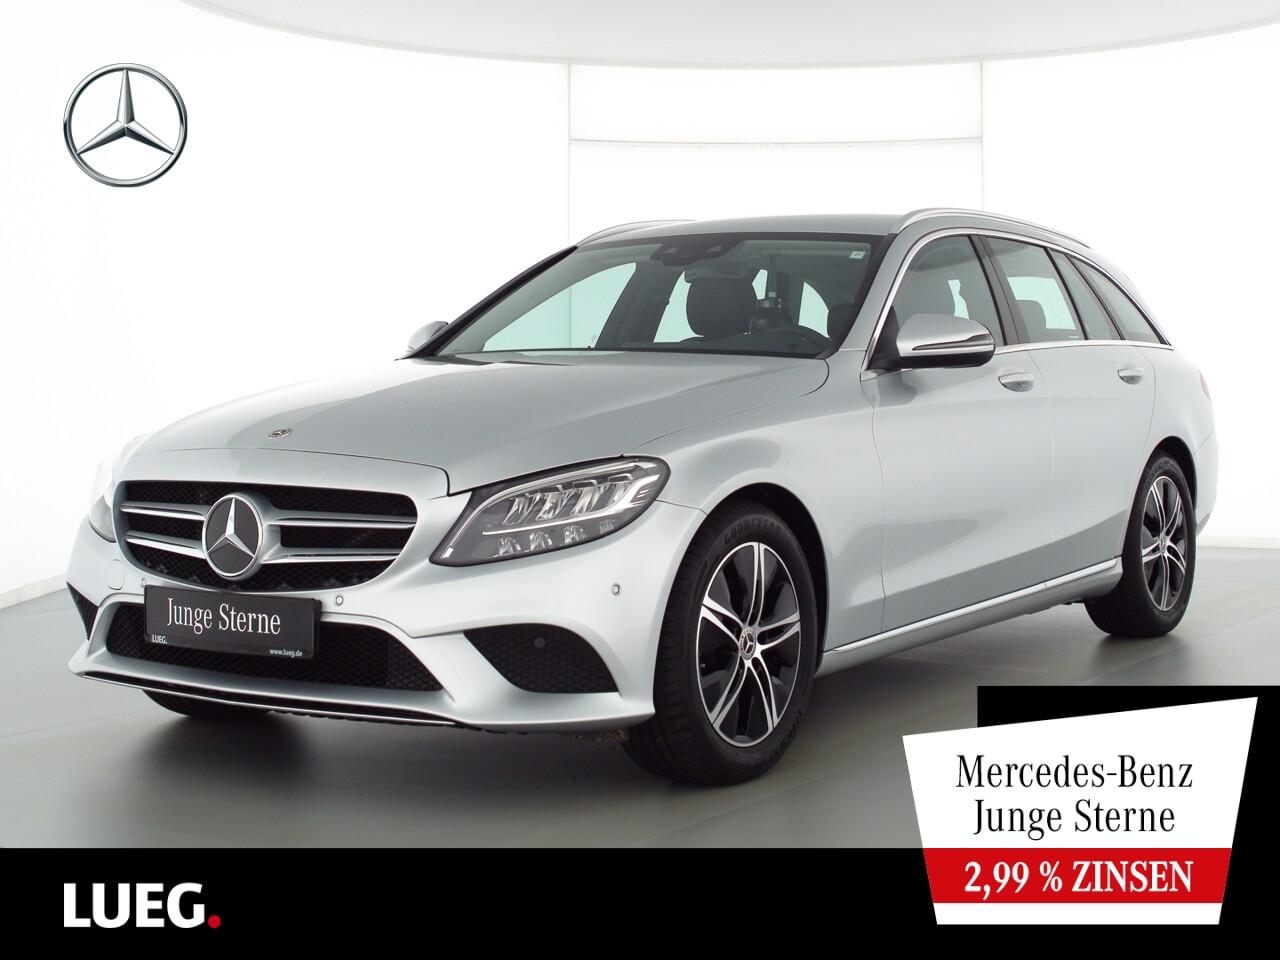 Mercedes-Benz C 220 d T Avantgarde+Navi+LED-HP+SpurPkt+AHK+RFK, Jahr 2020, Diesel